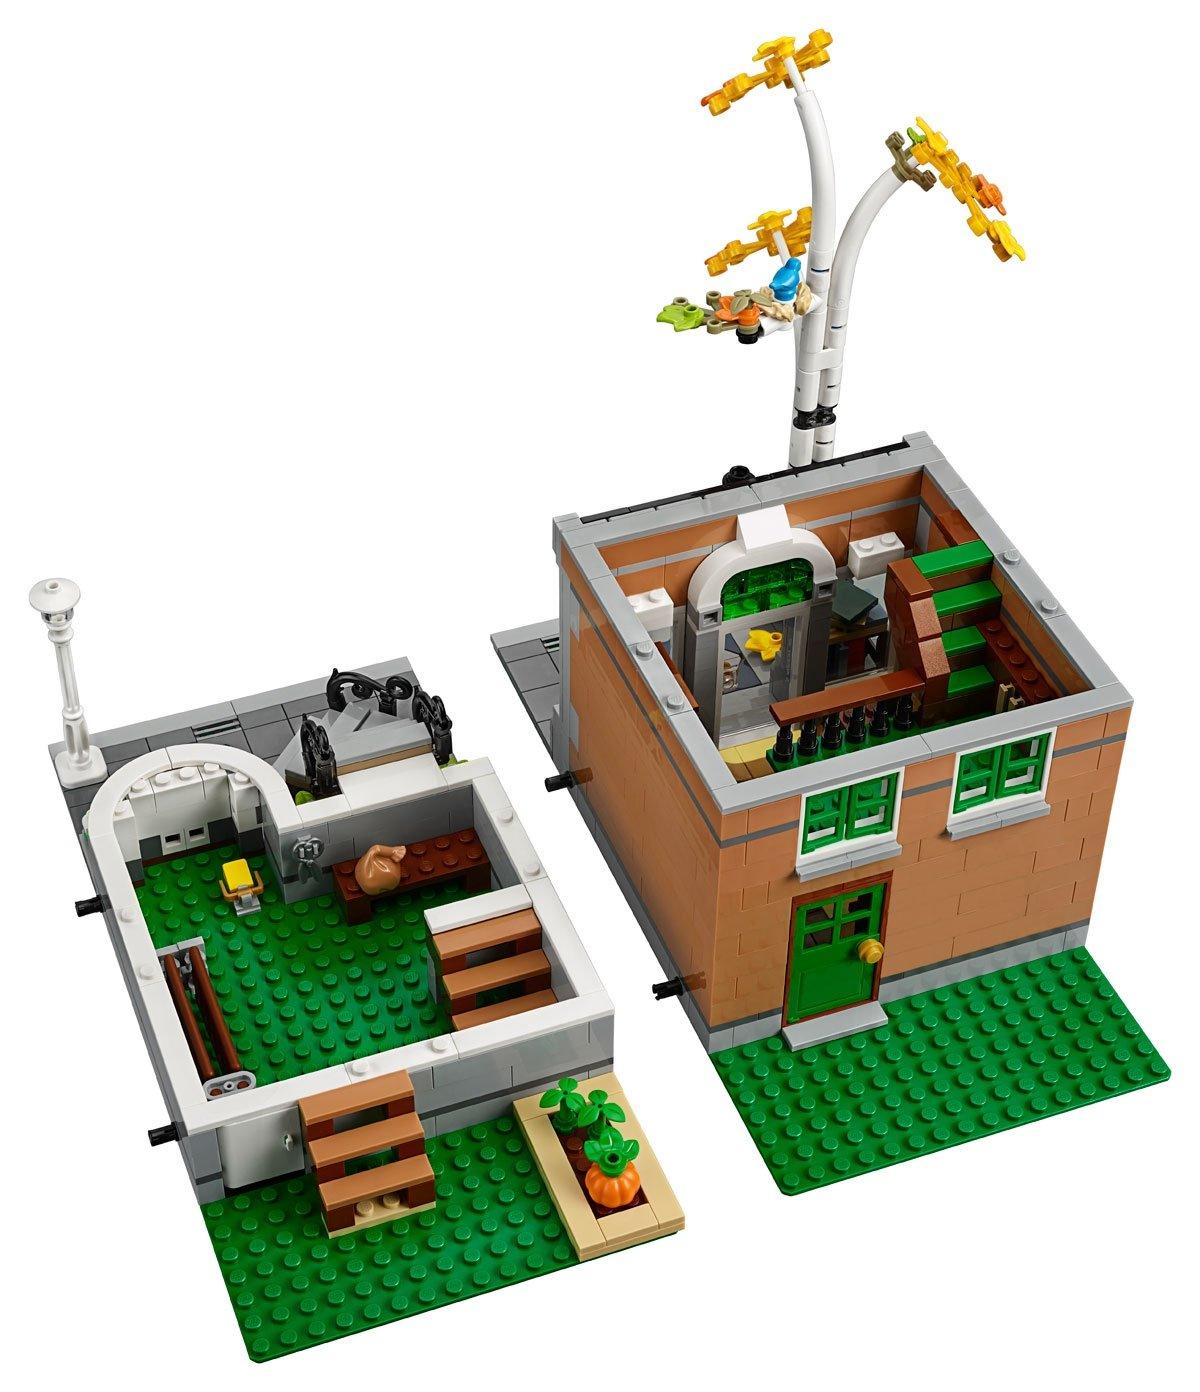 LEGO 10270 Creator Expert Modular Bookshop floors 4